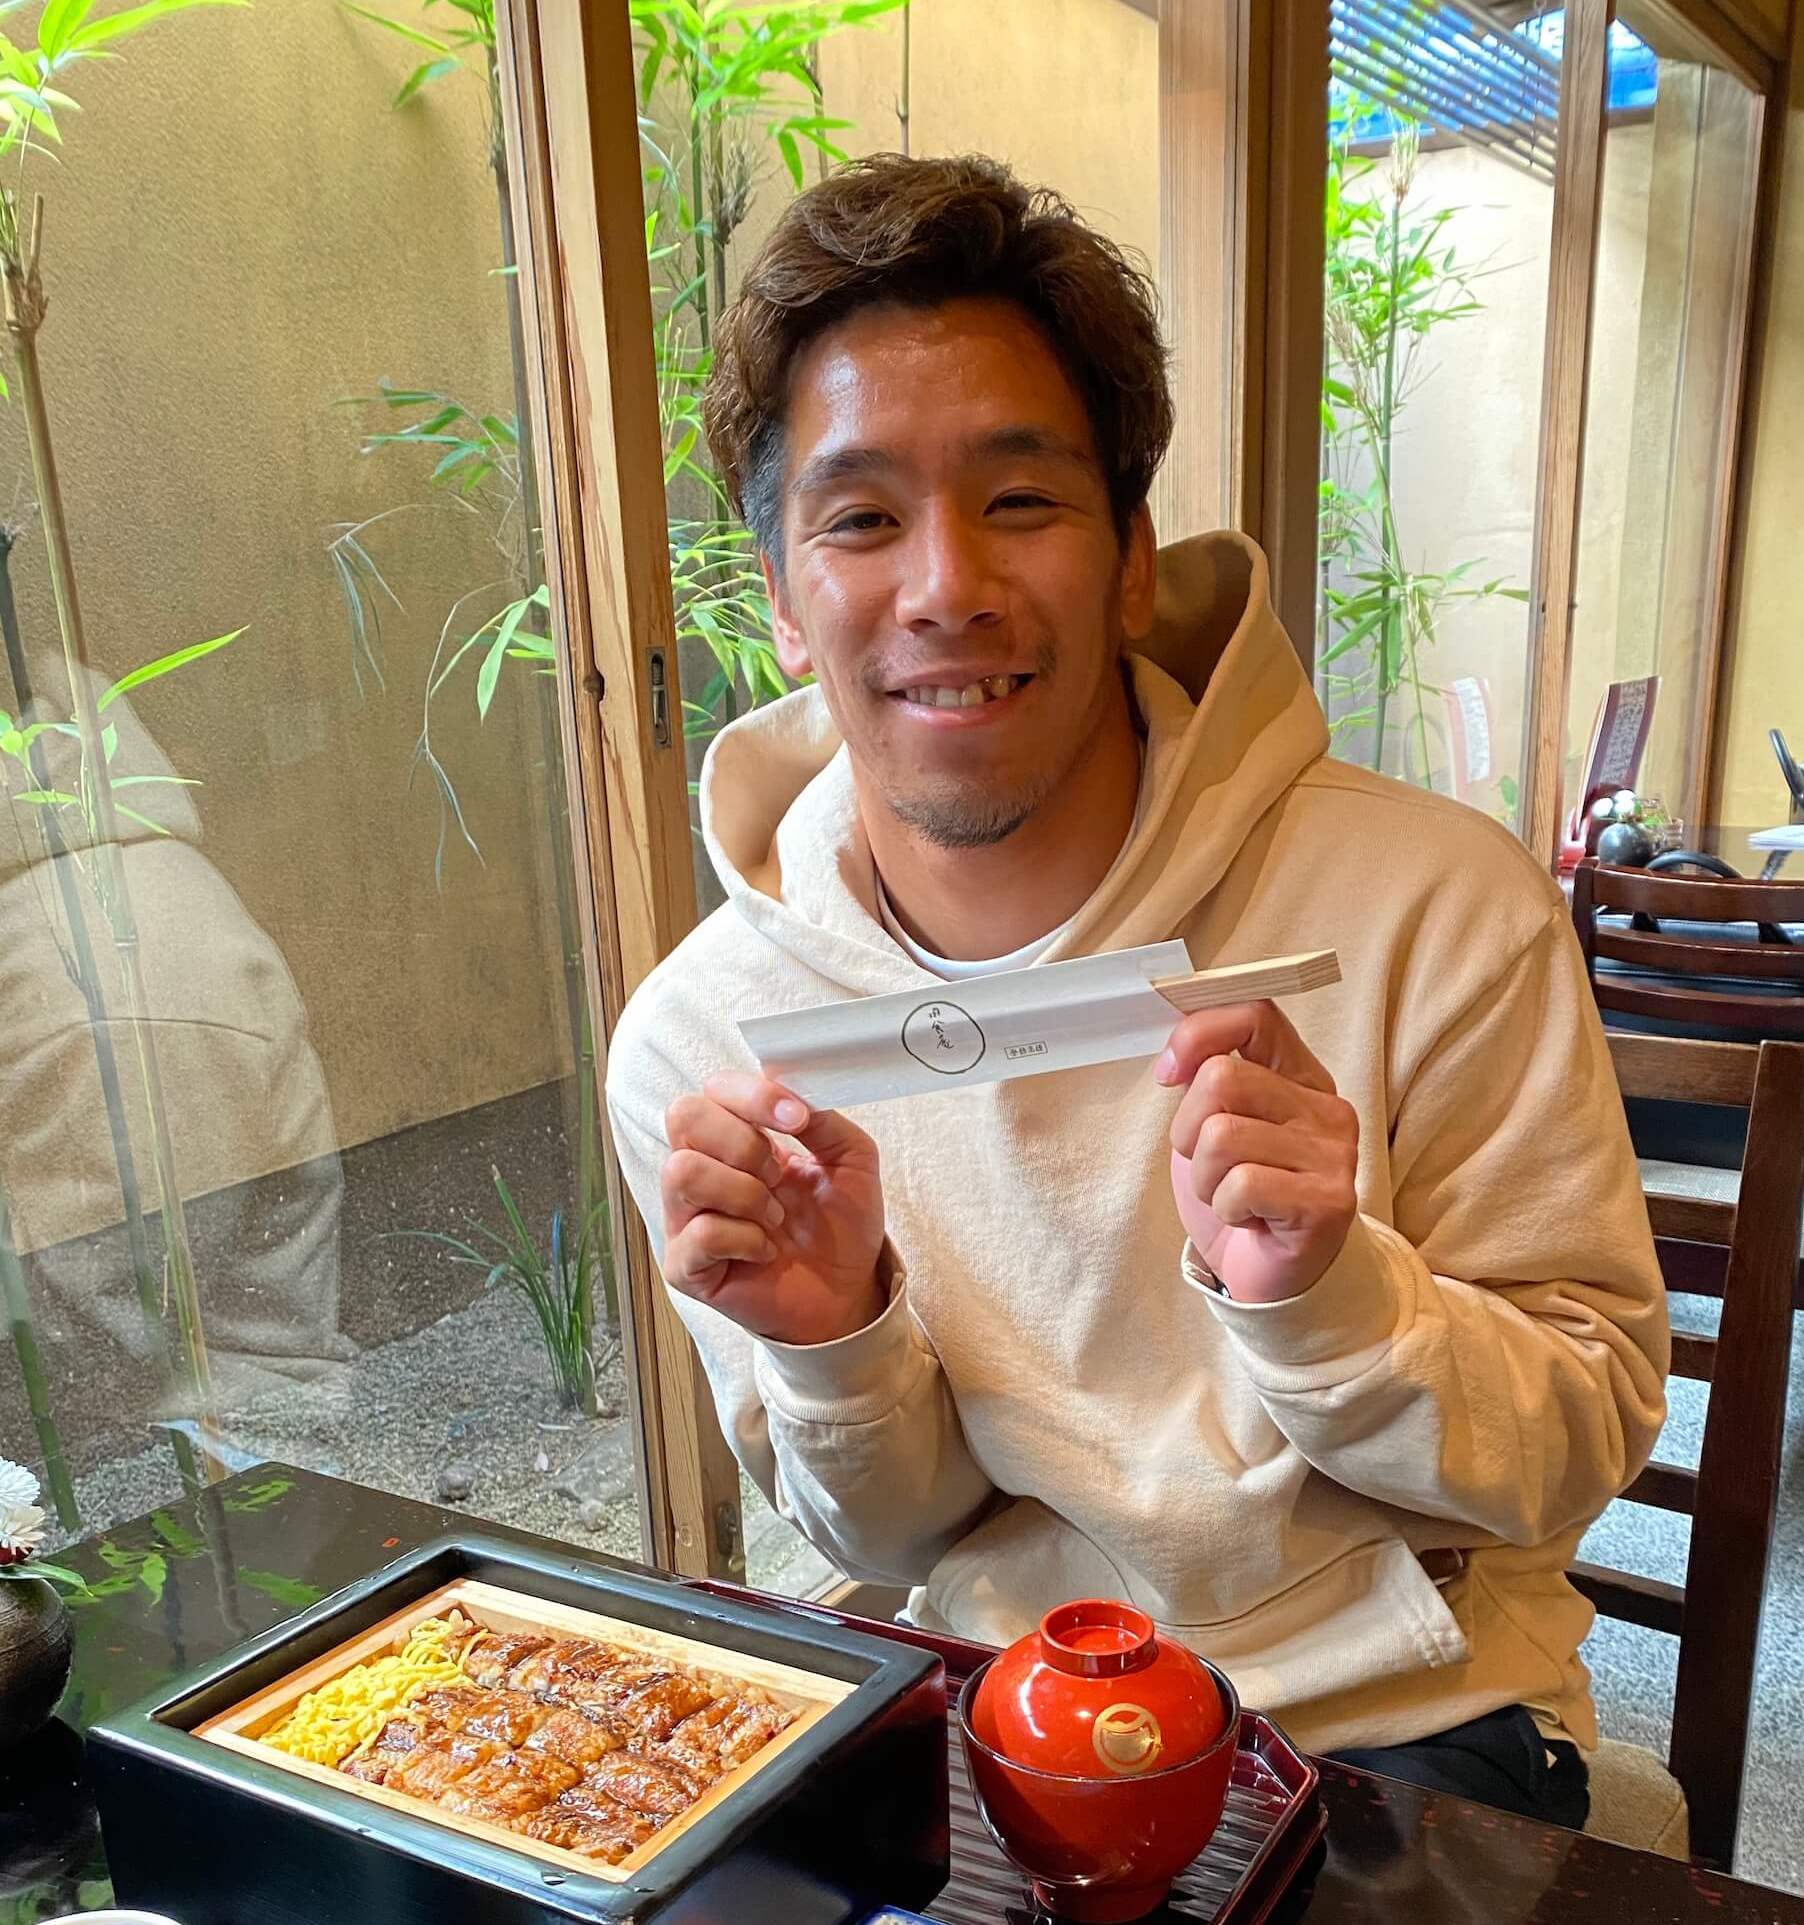 Vol.86 今日の一枚 ギラヴァンツ北九州/國分伸太郎選手